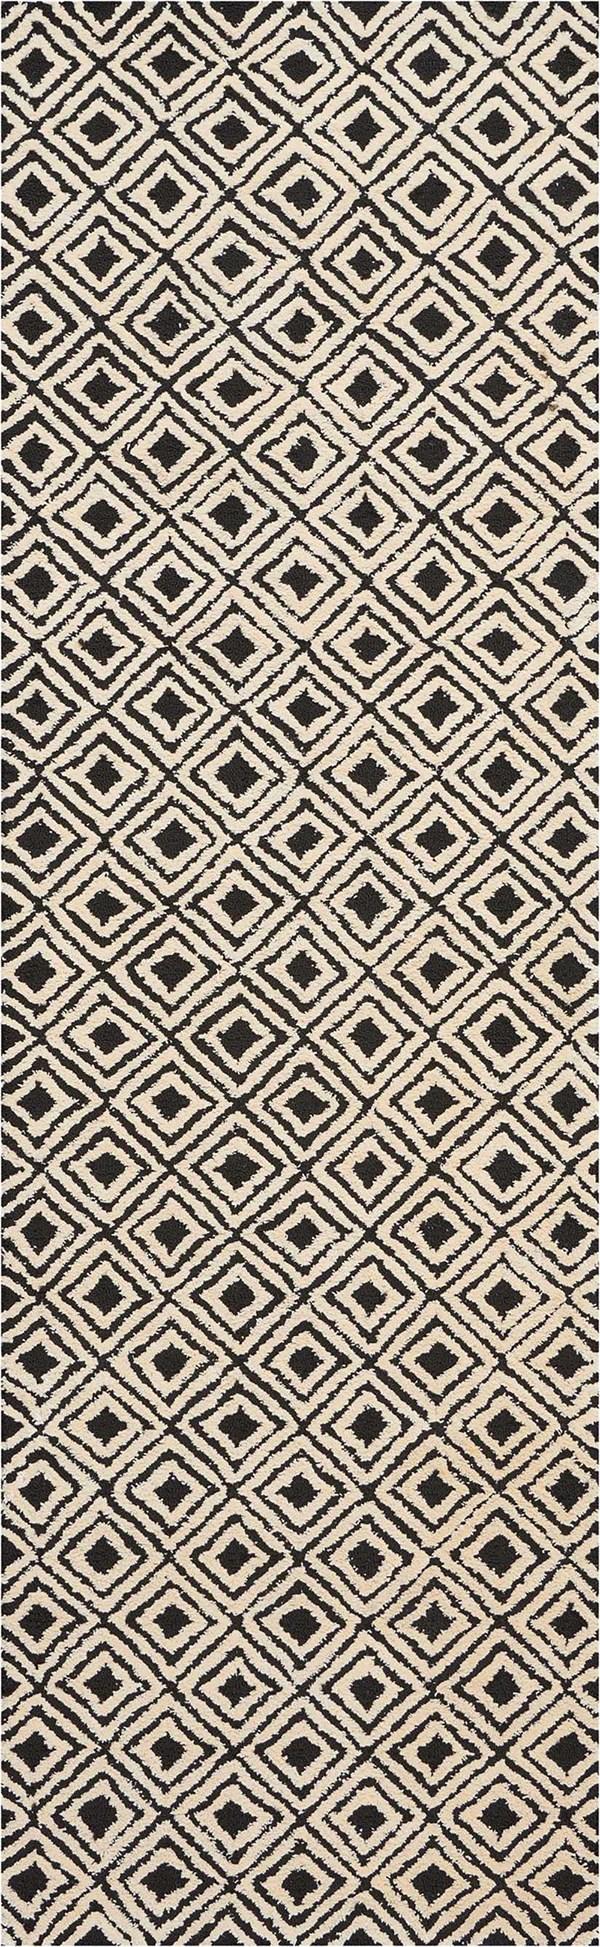 Black, Beige Geometric Area Rug